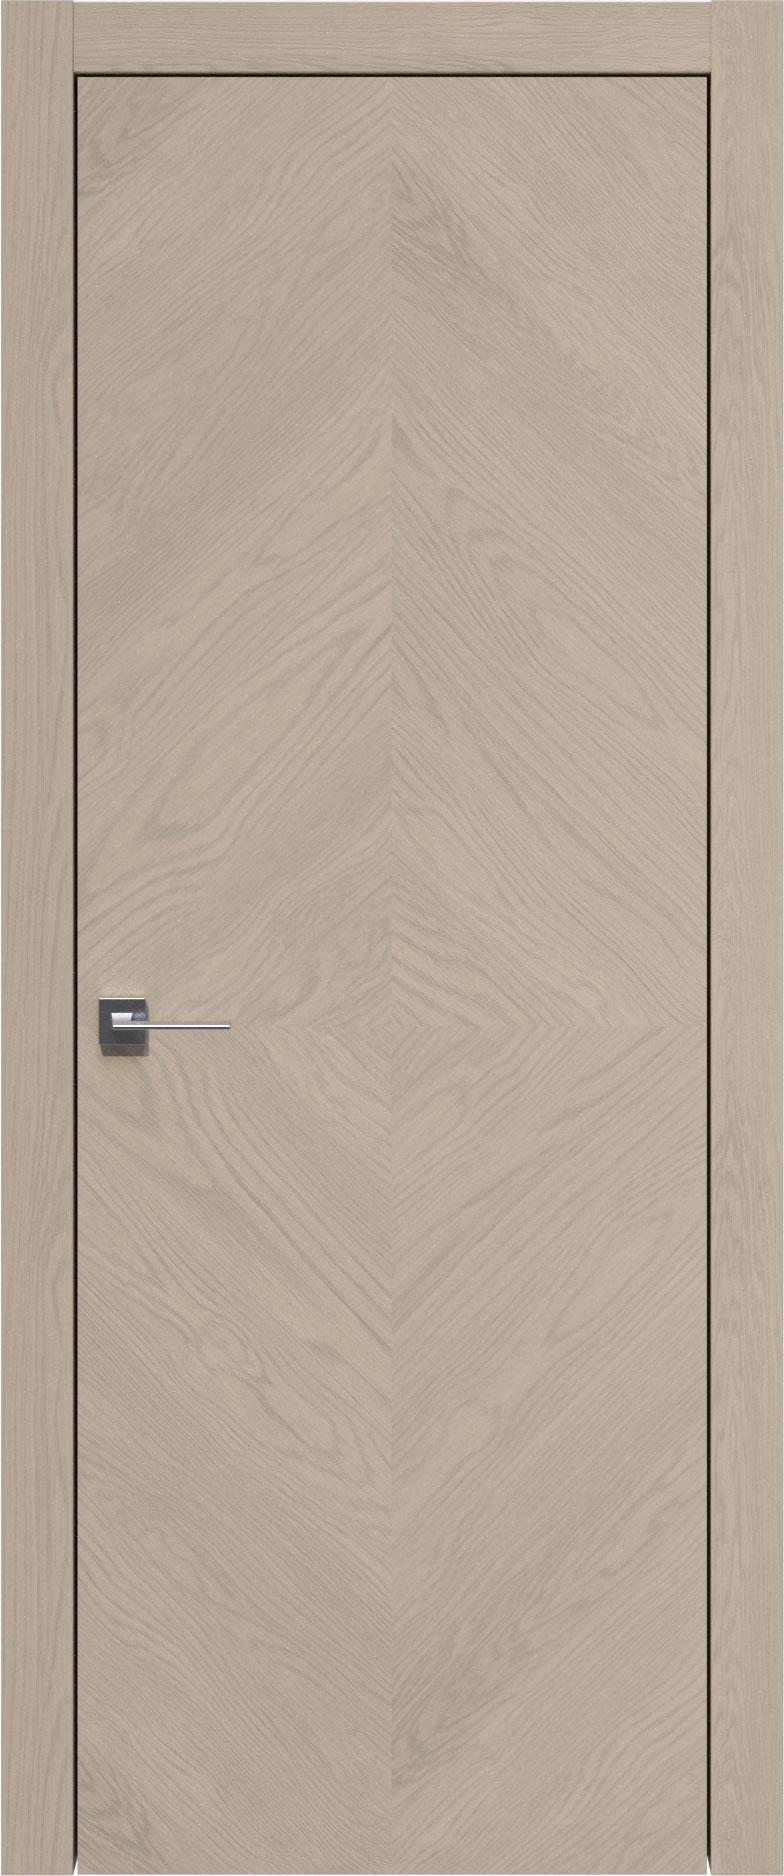 Tivoli К-1 цвет - Дуб муар Без стекла (ДГ)